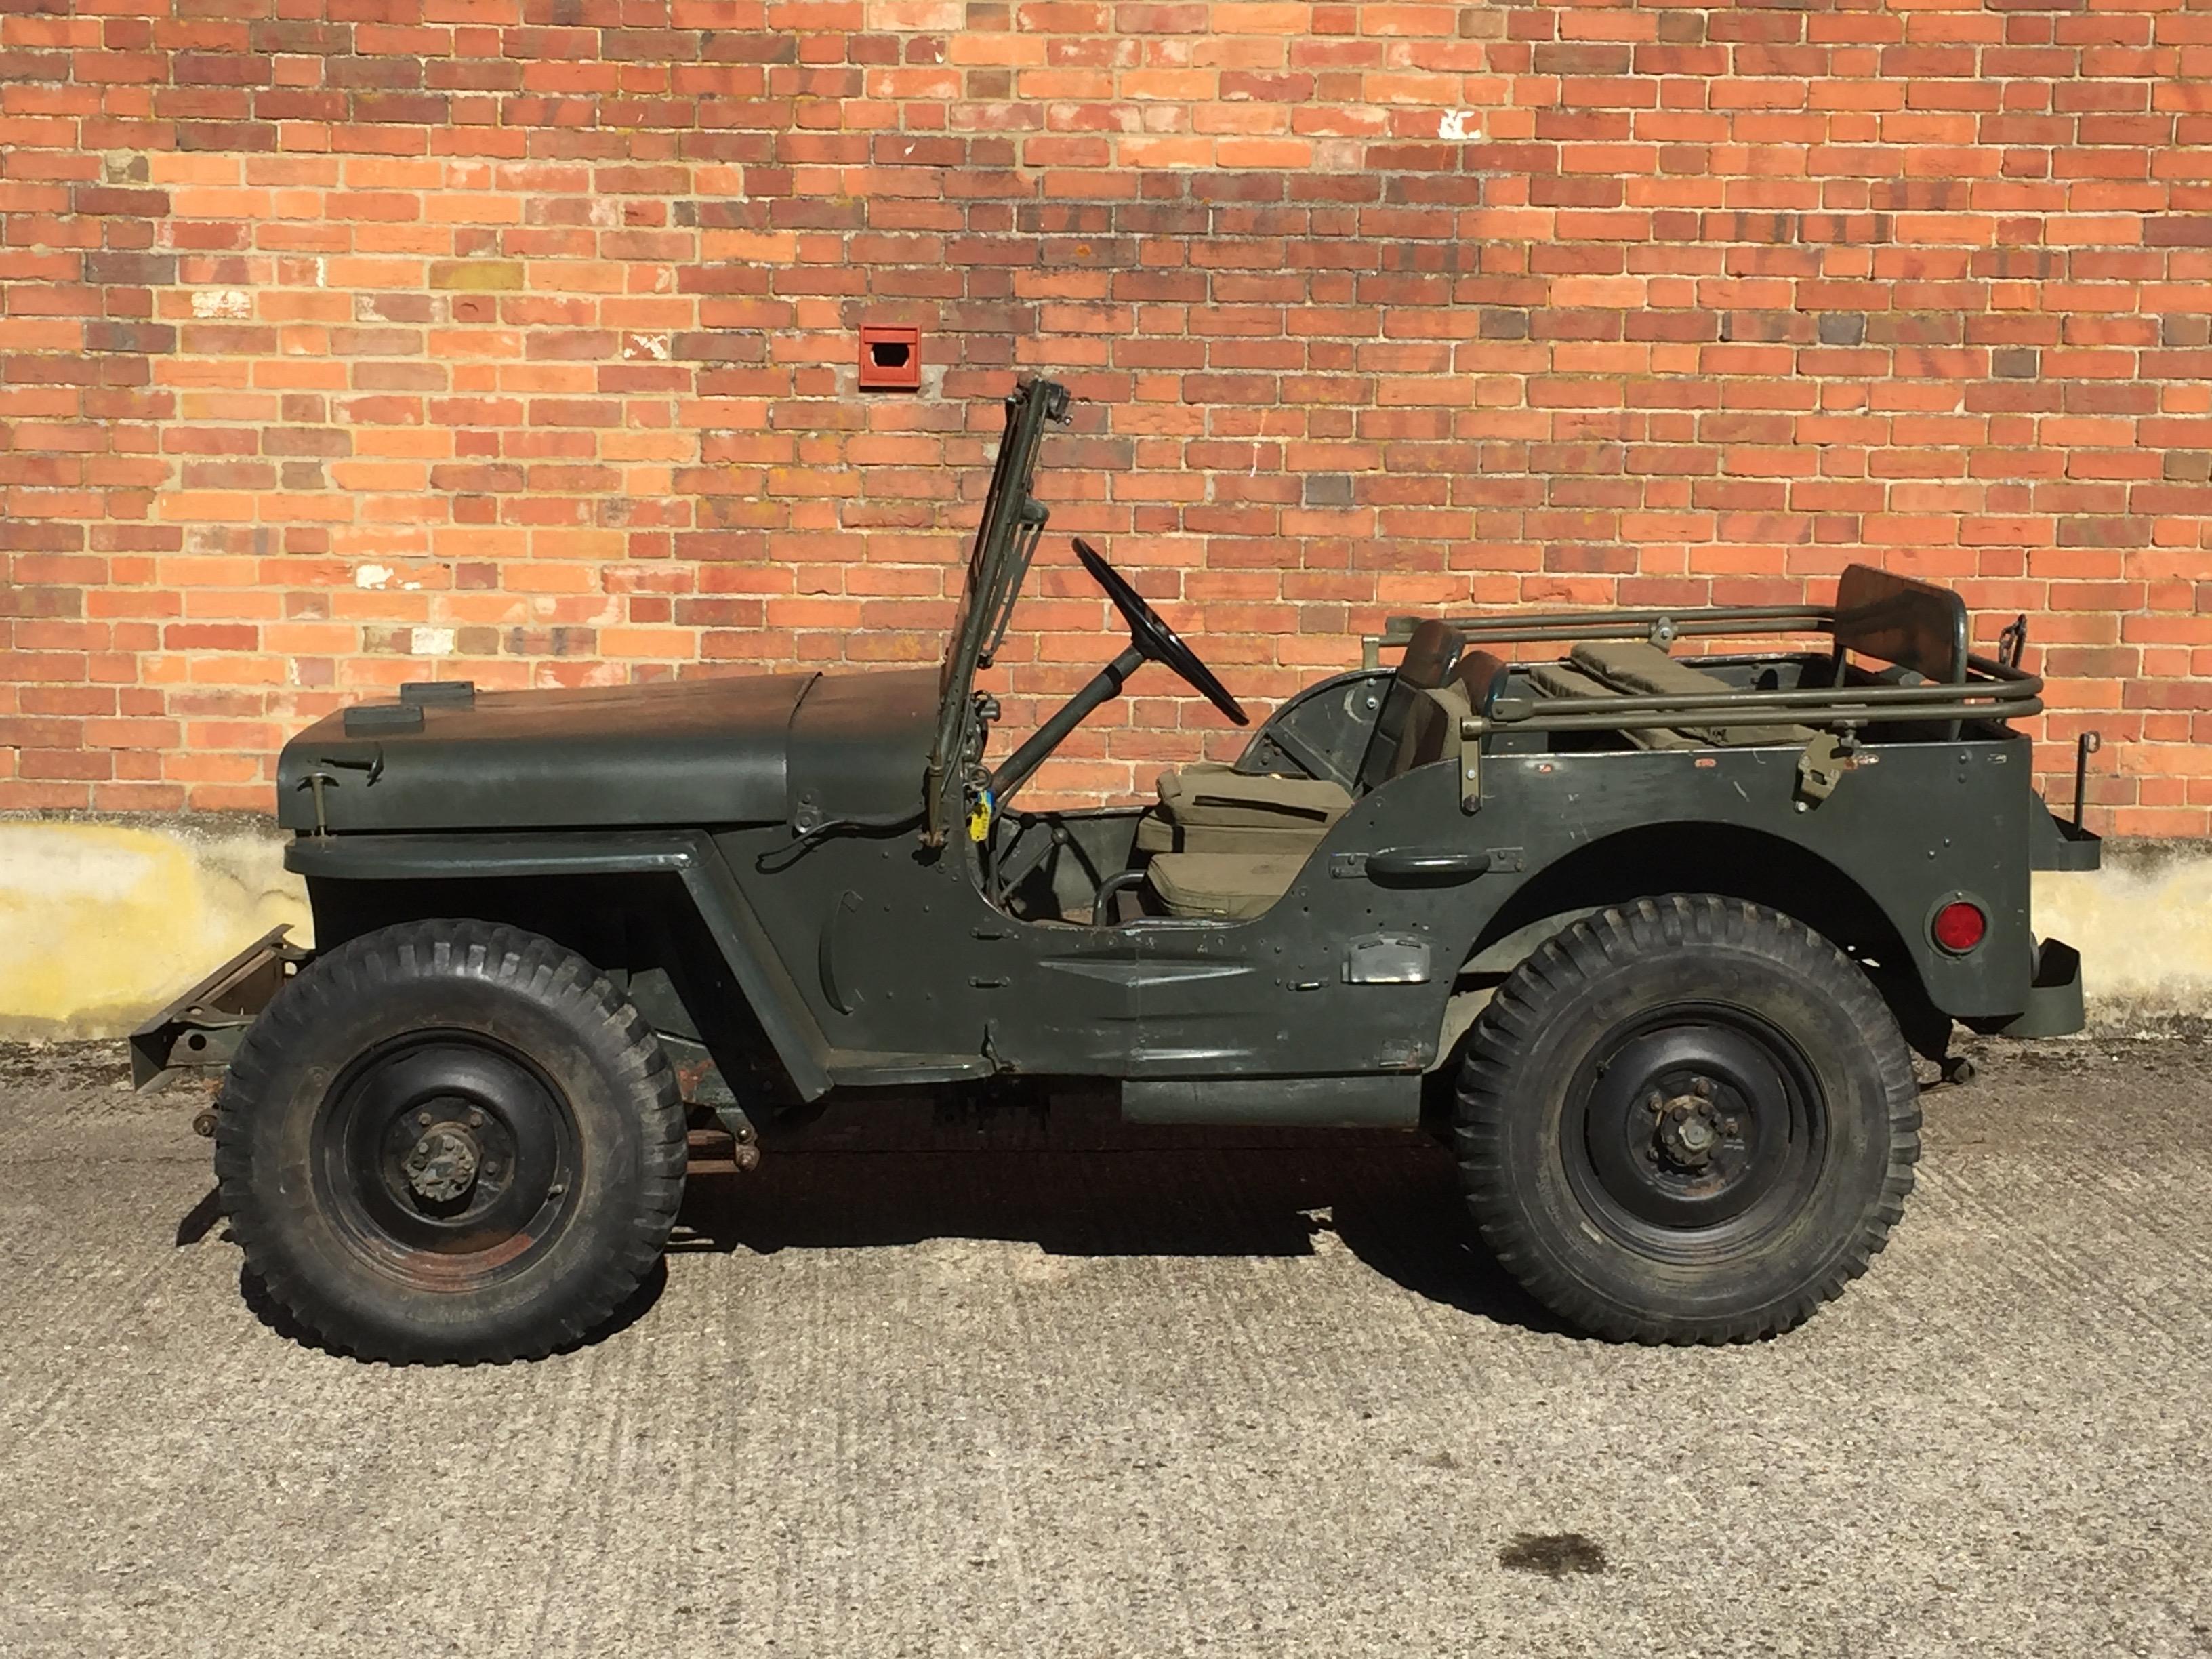 Vehicles For Sale - Dallas Auto Parts